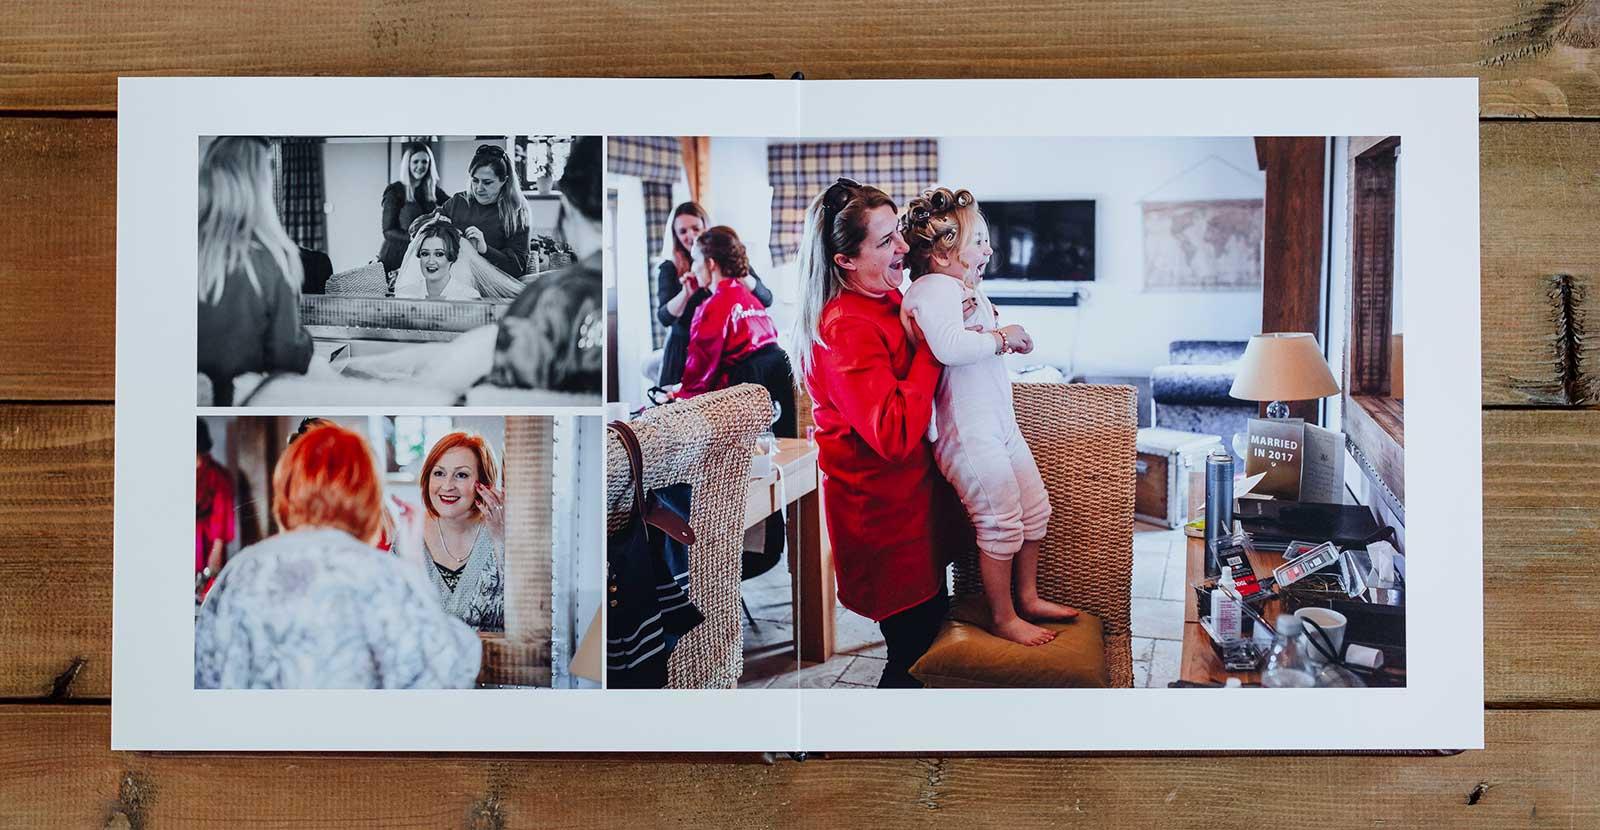 photographers perspective on wedding blues